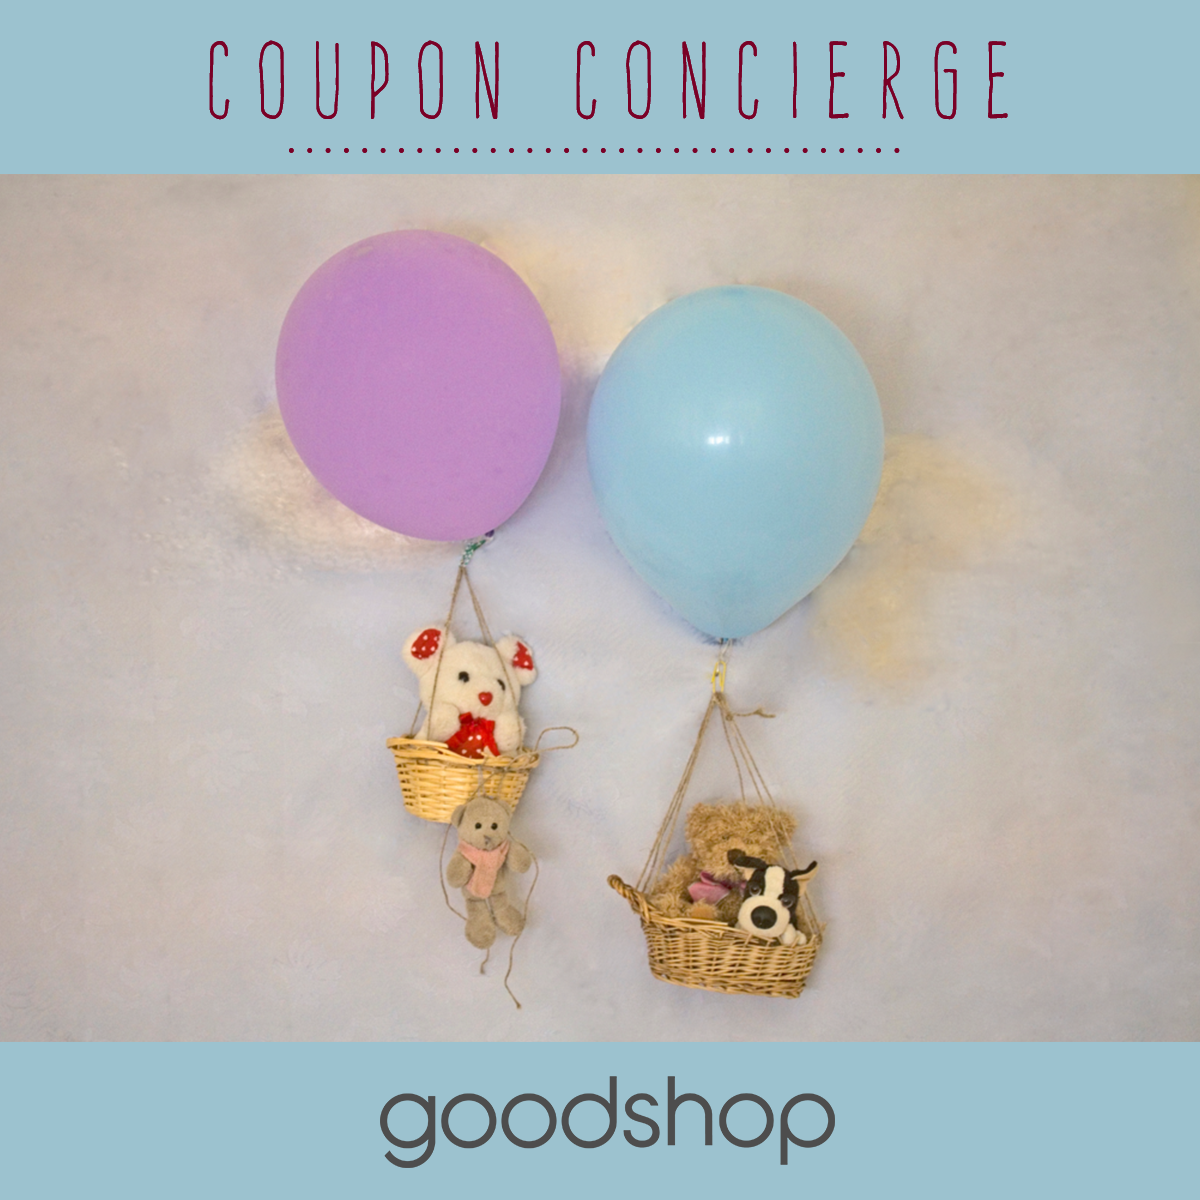 concierge-facebook-1200x1200-10.png